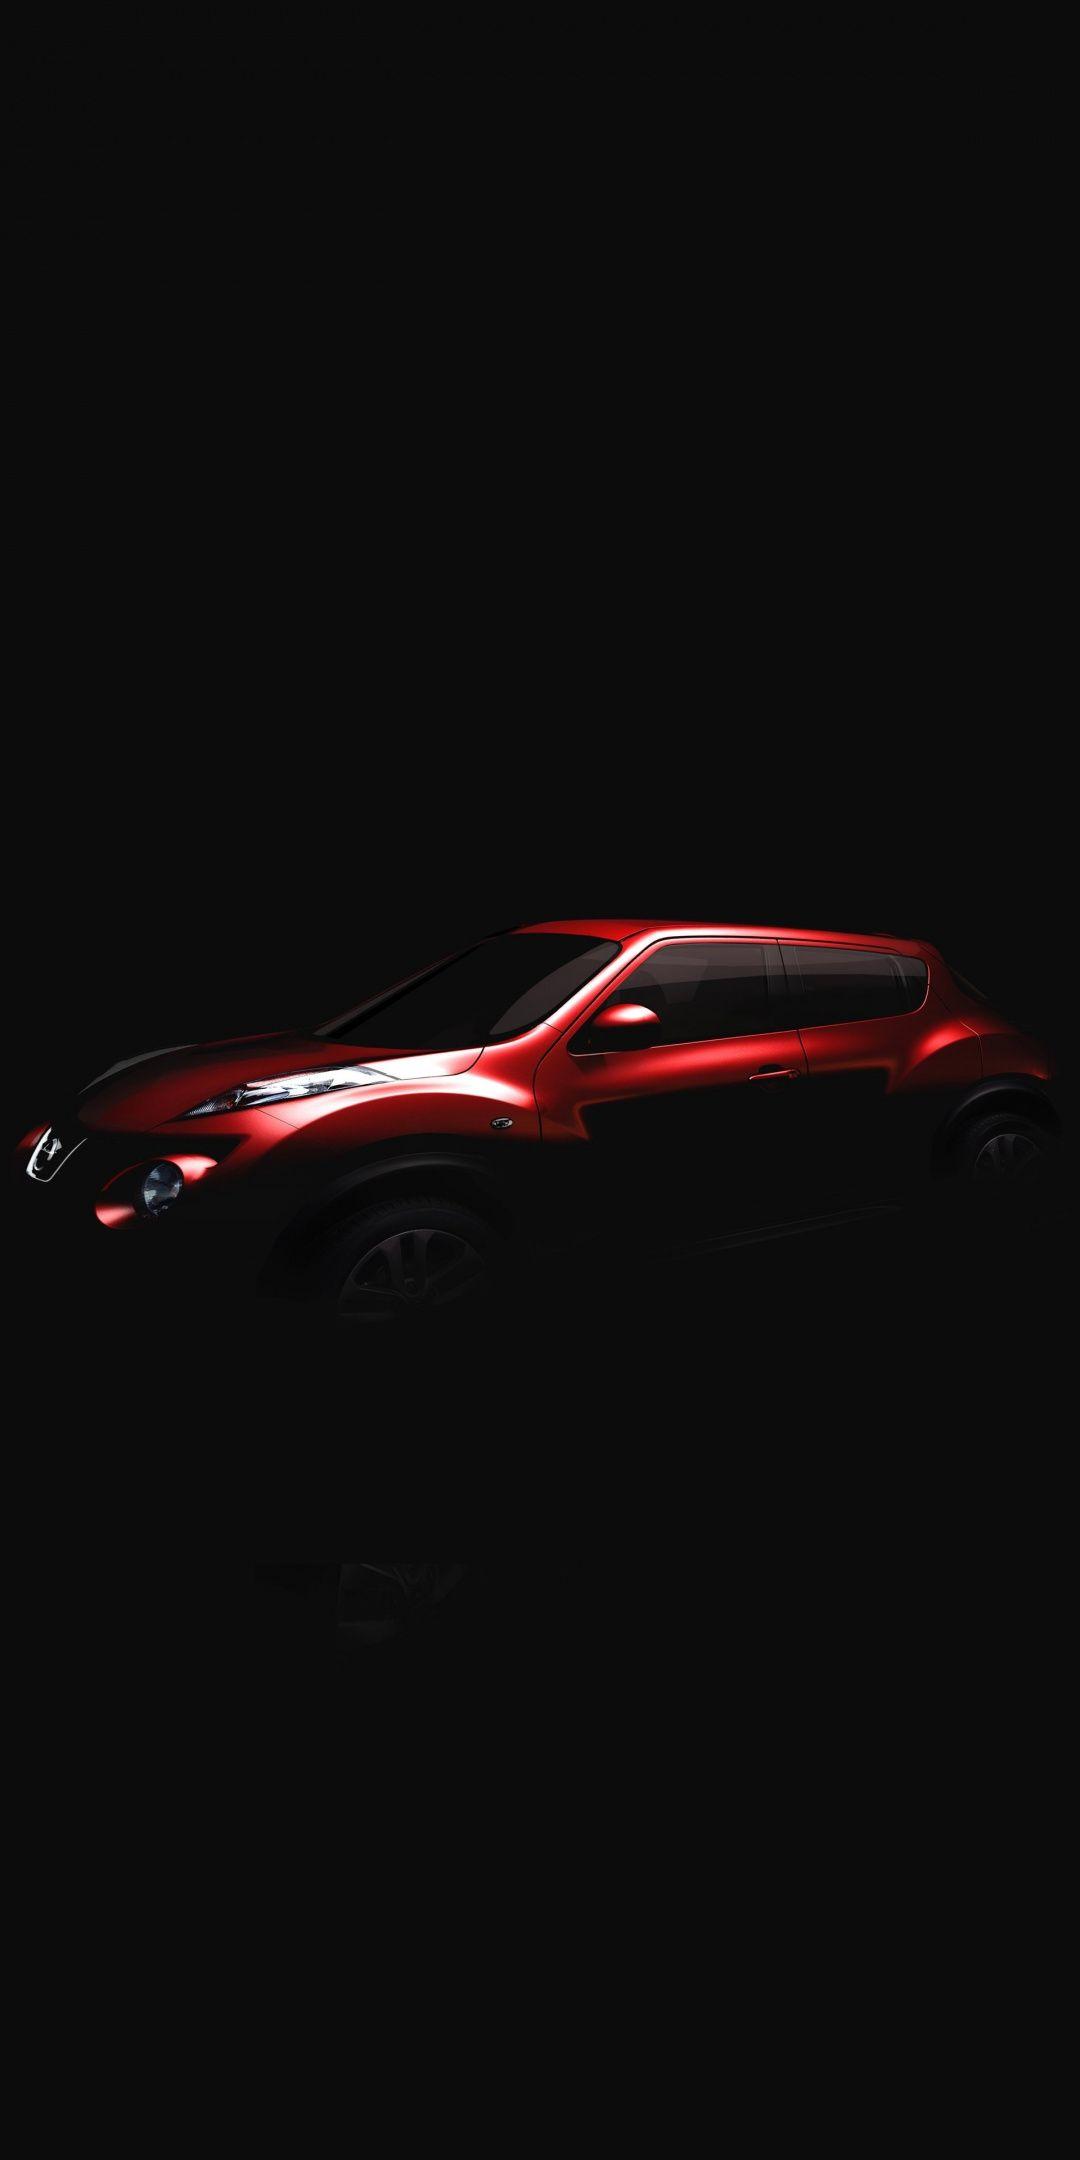 Nissan Juke Red Car Portrait 1080x2160 Wallpaper Nissan Juke Red Car Nissan